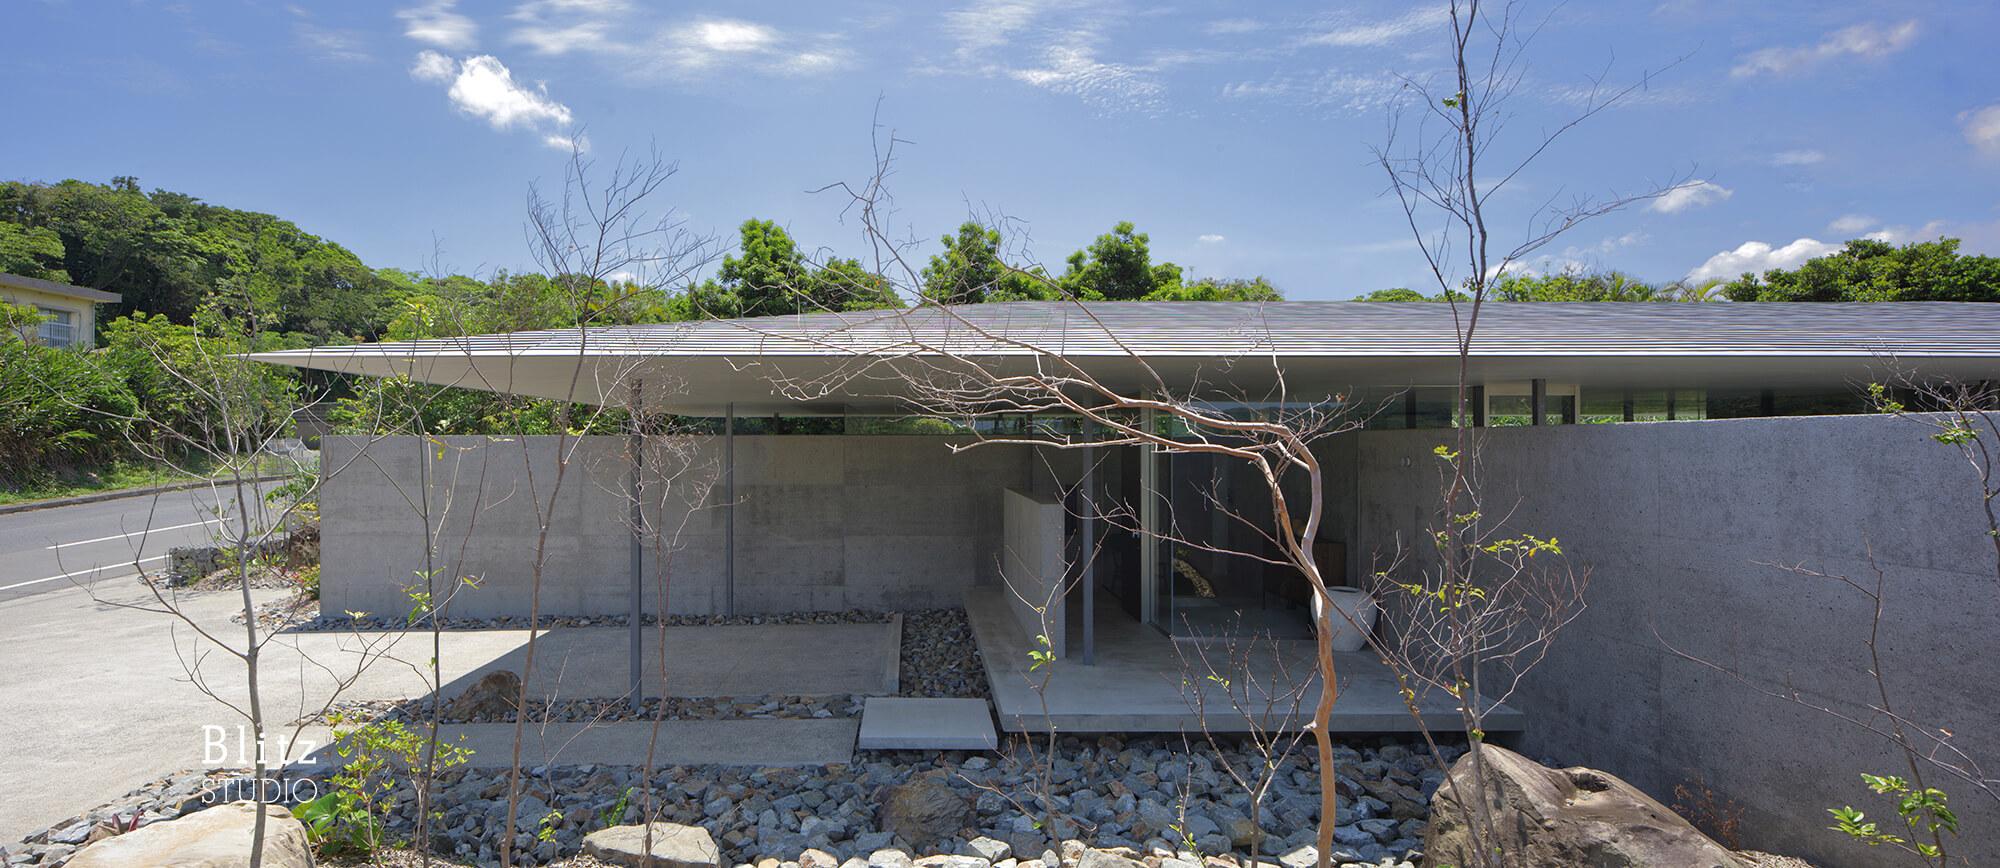 『父母の家』-鹿児島県奄美大島-建築写真・竣工写真・インテリア写真2